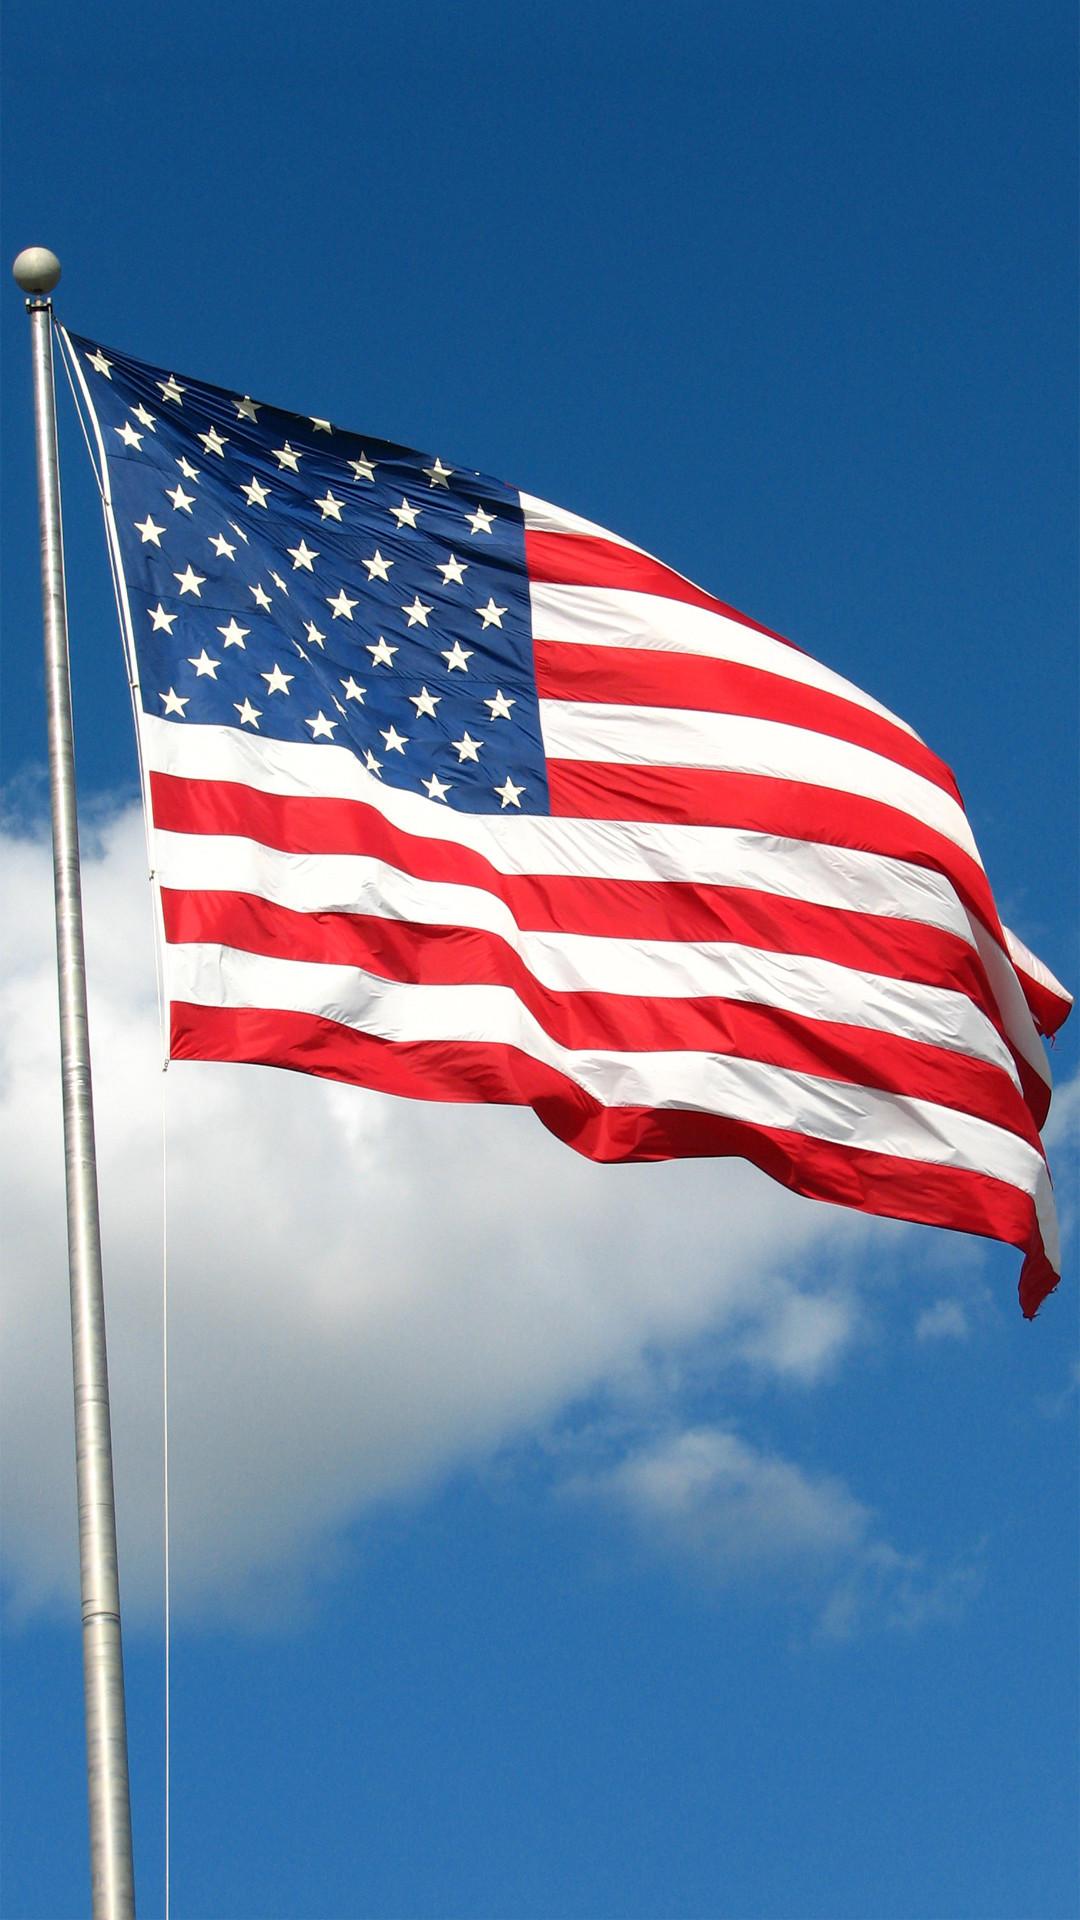 USA-American-Flag-Sky-Android-Wallpaper-by-vitdemon